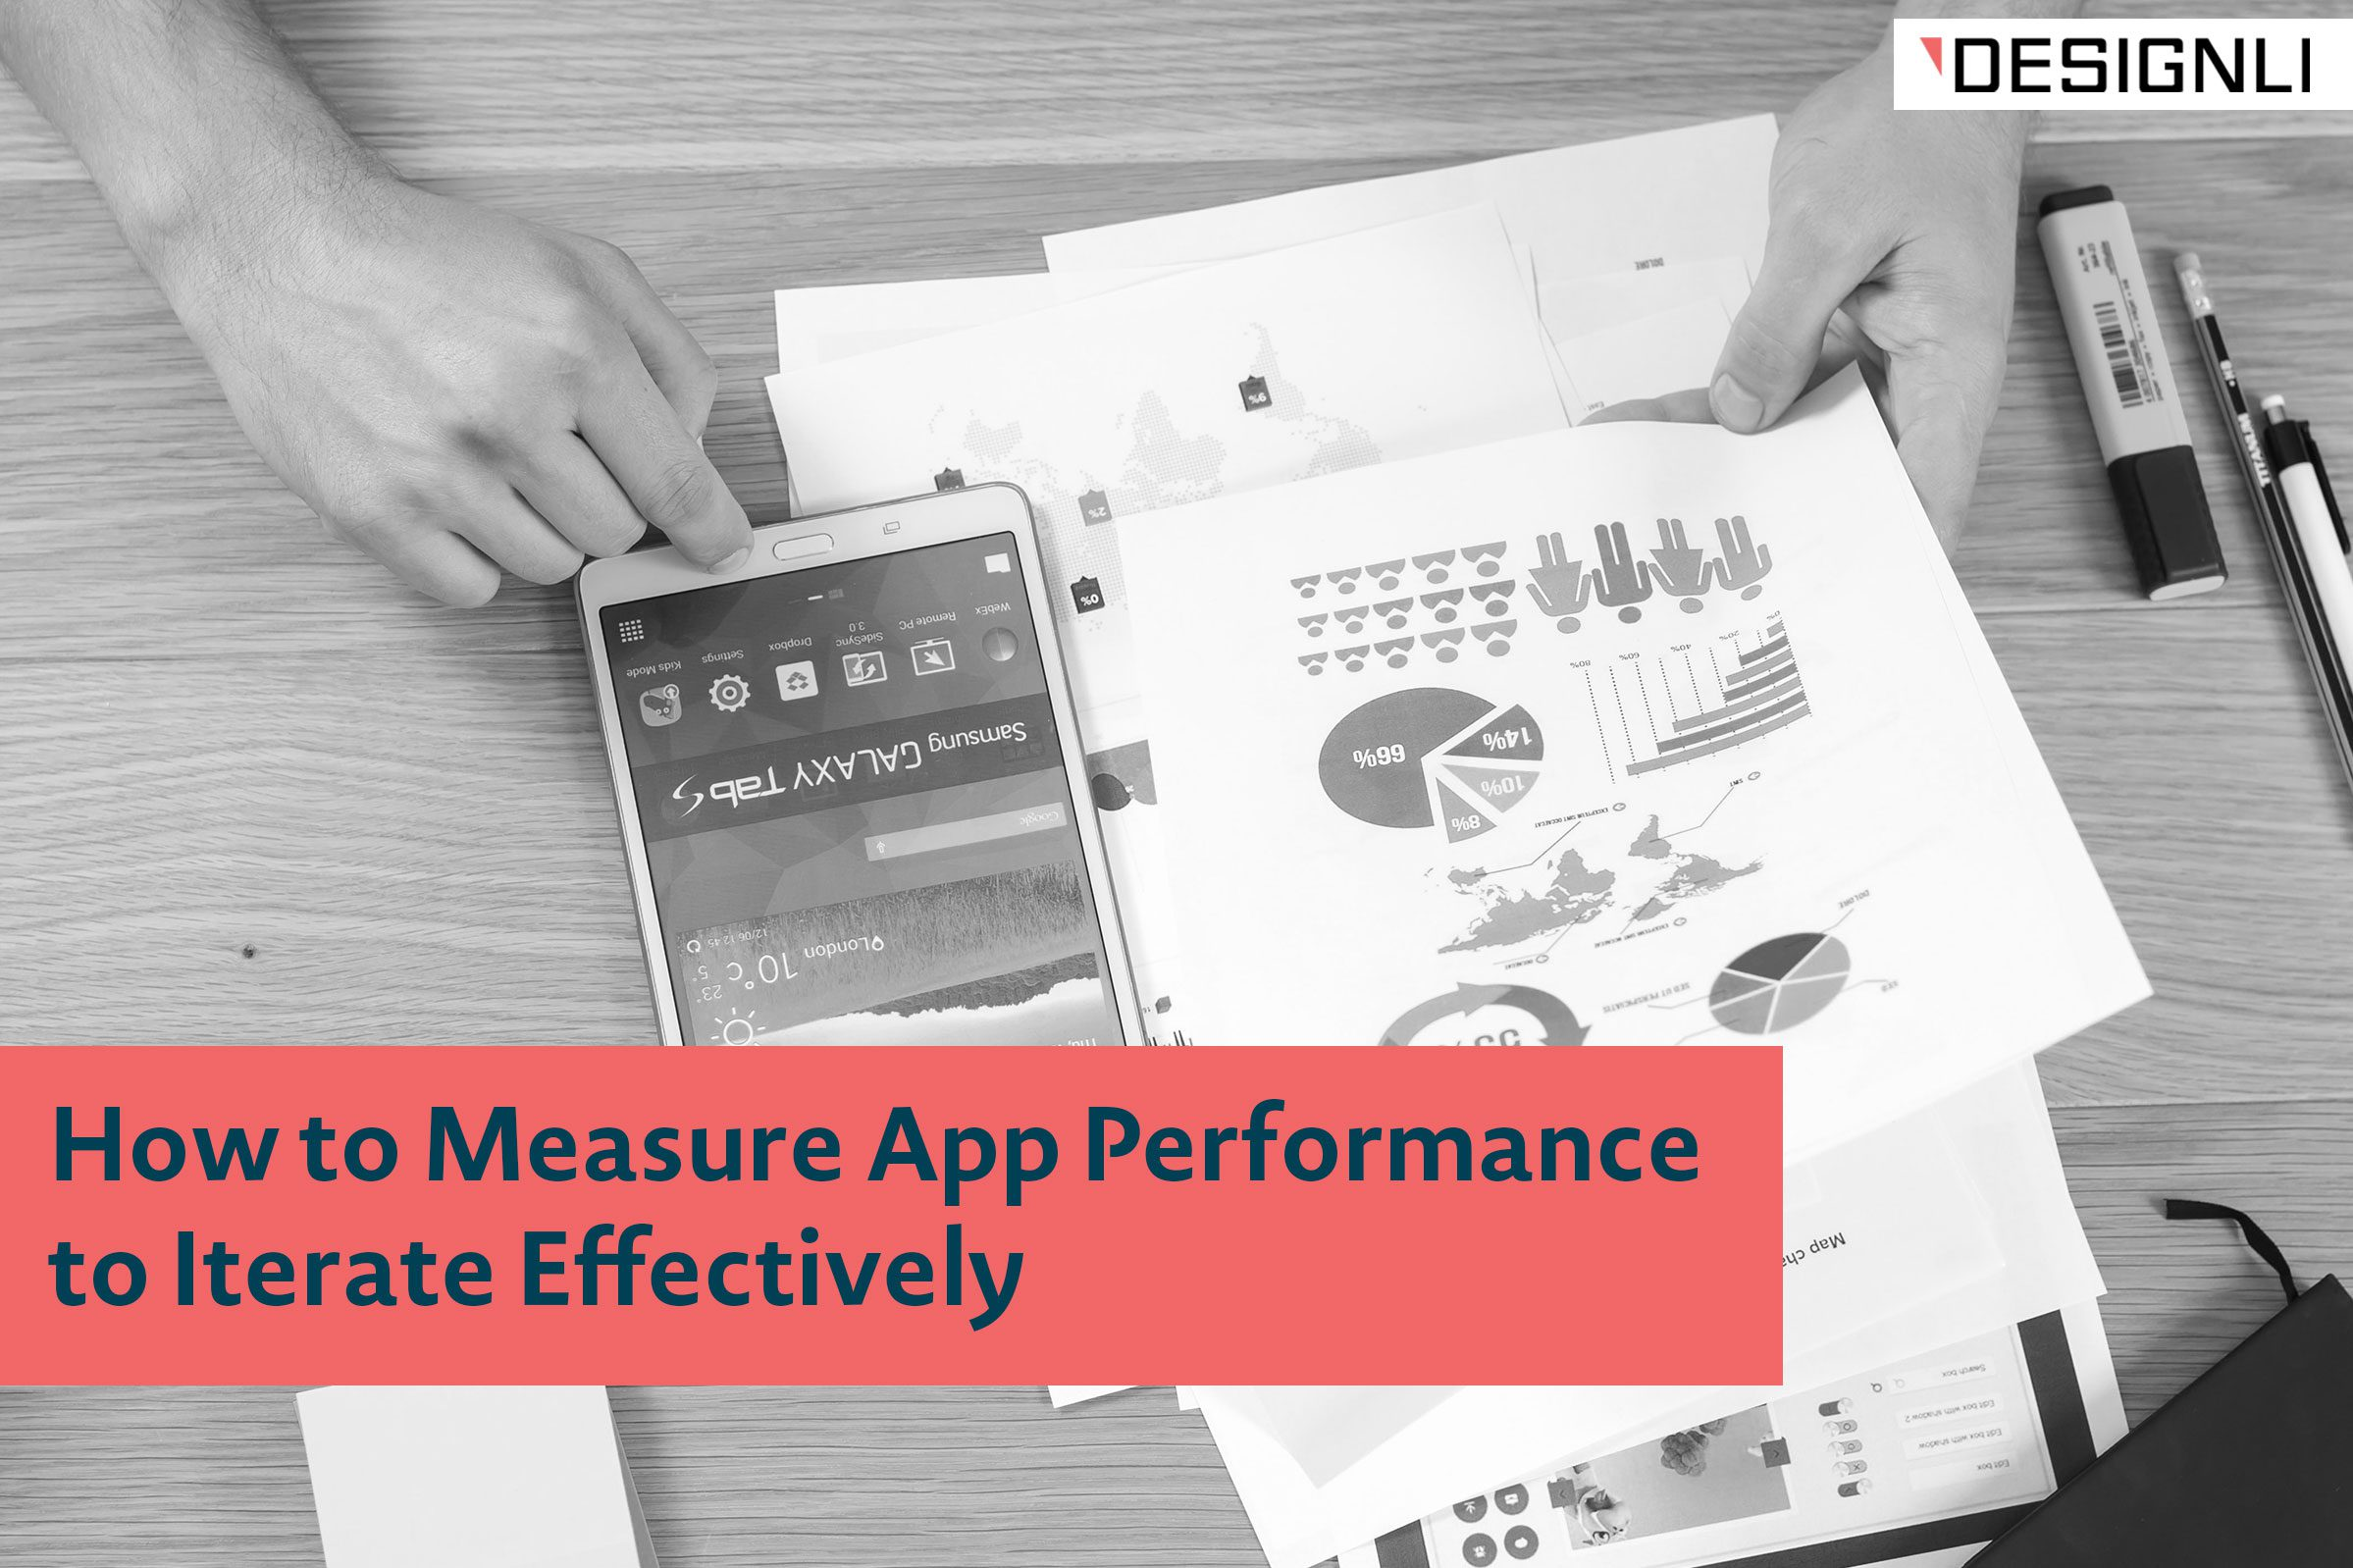 measure app performance